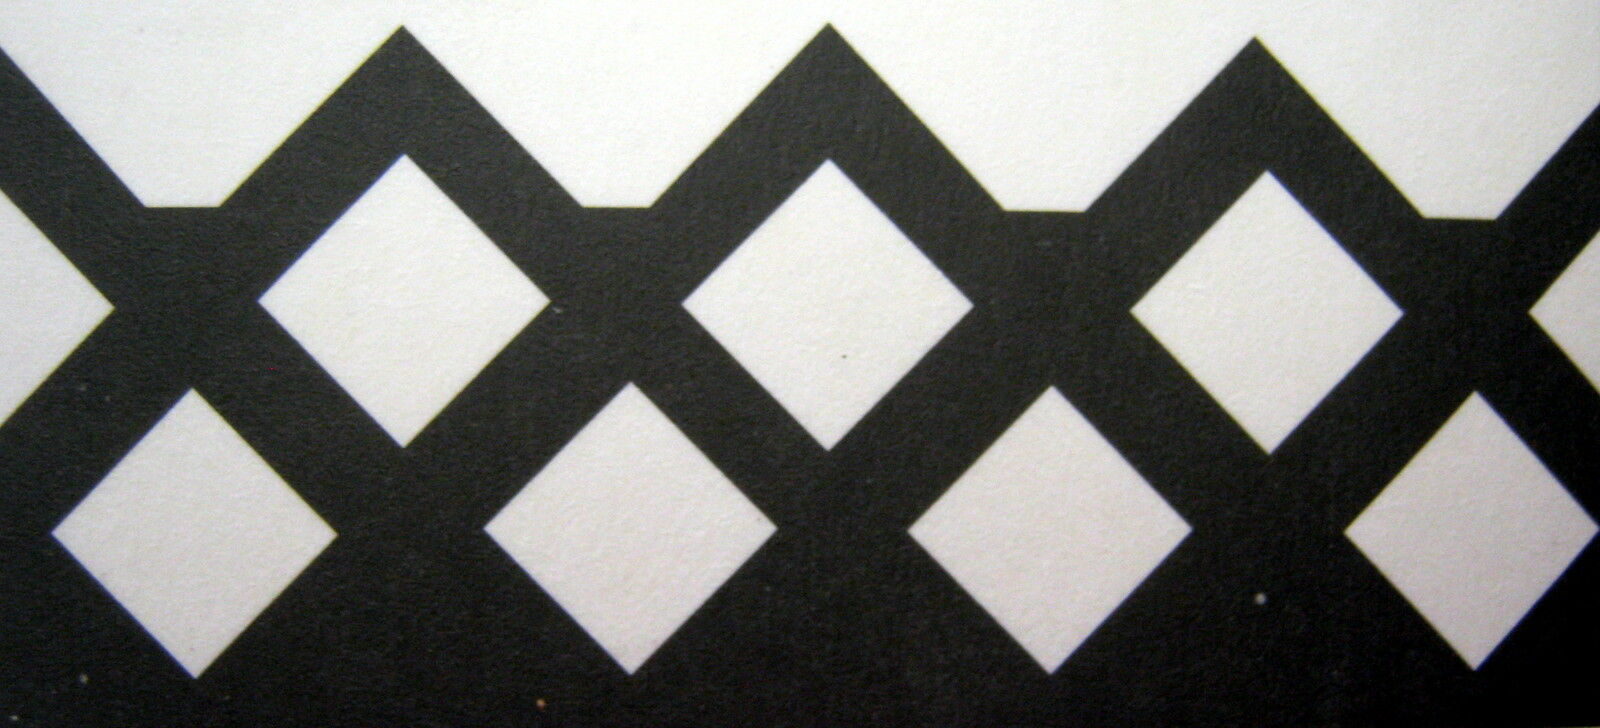 Fiskars DIAMONDS Continuous Border Punch Scrapbook Paper Intricate Weave NIP